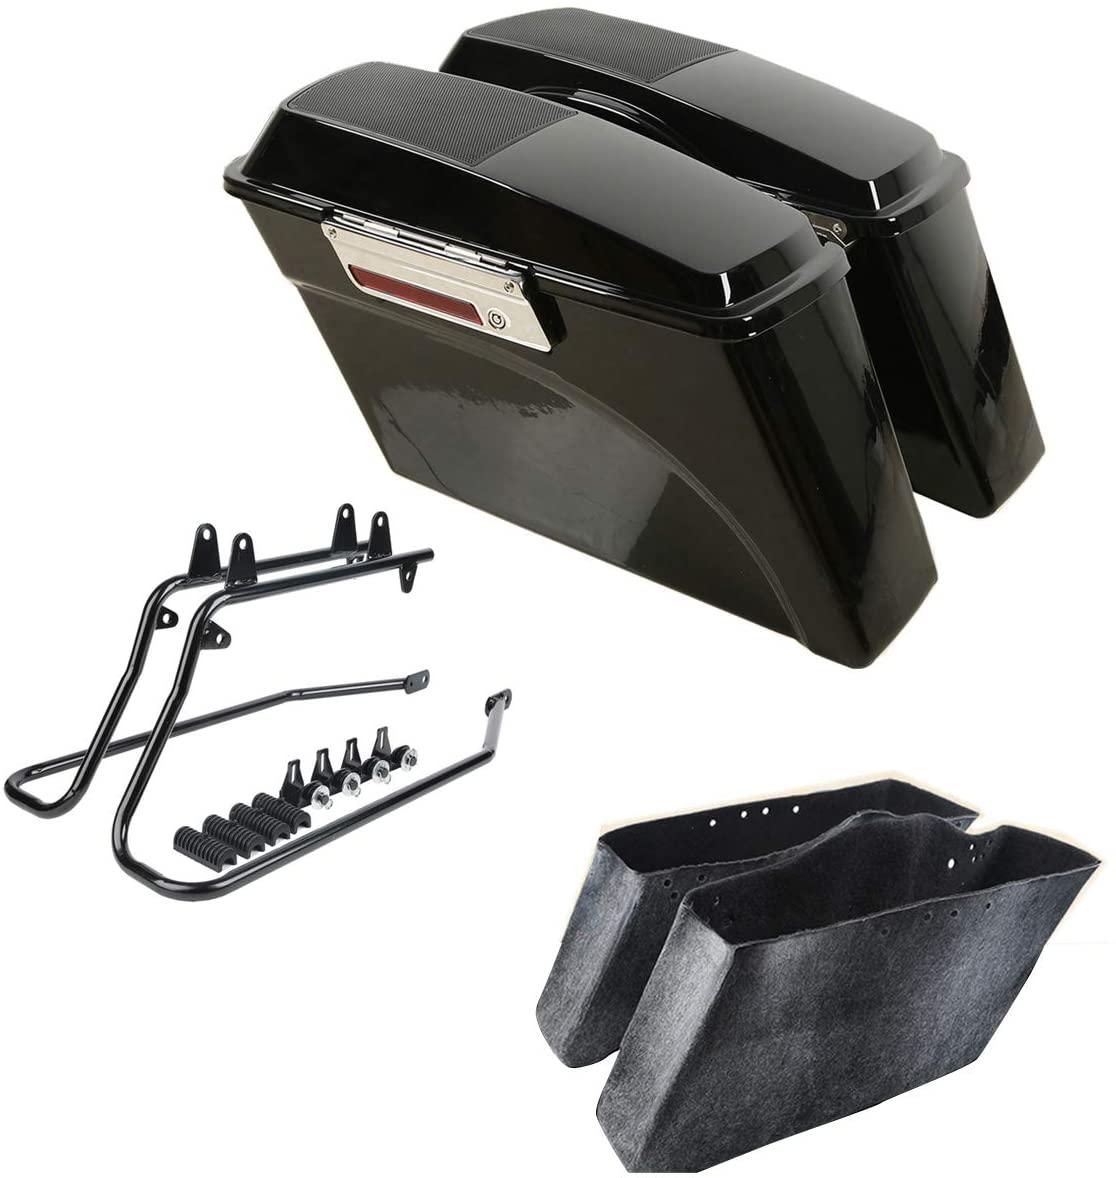 XFMT Hard Saddlebags W/Speaker Lid & Conversion Brackets For Harley Softail 1986-2013